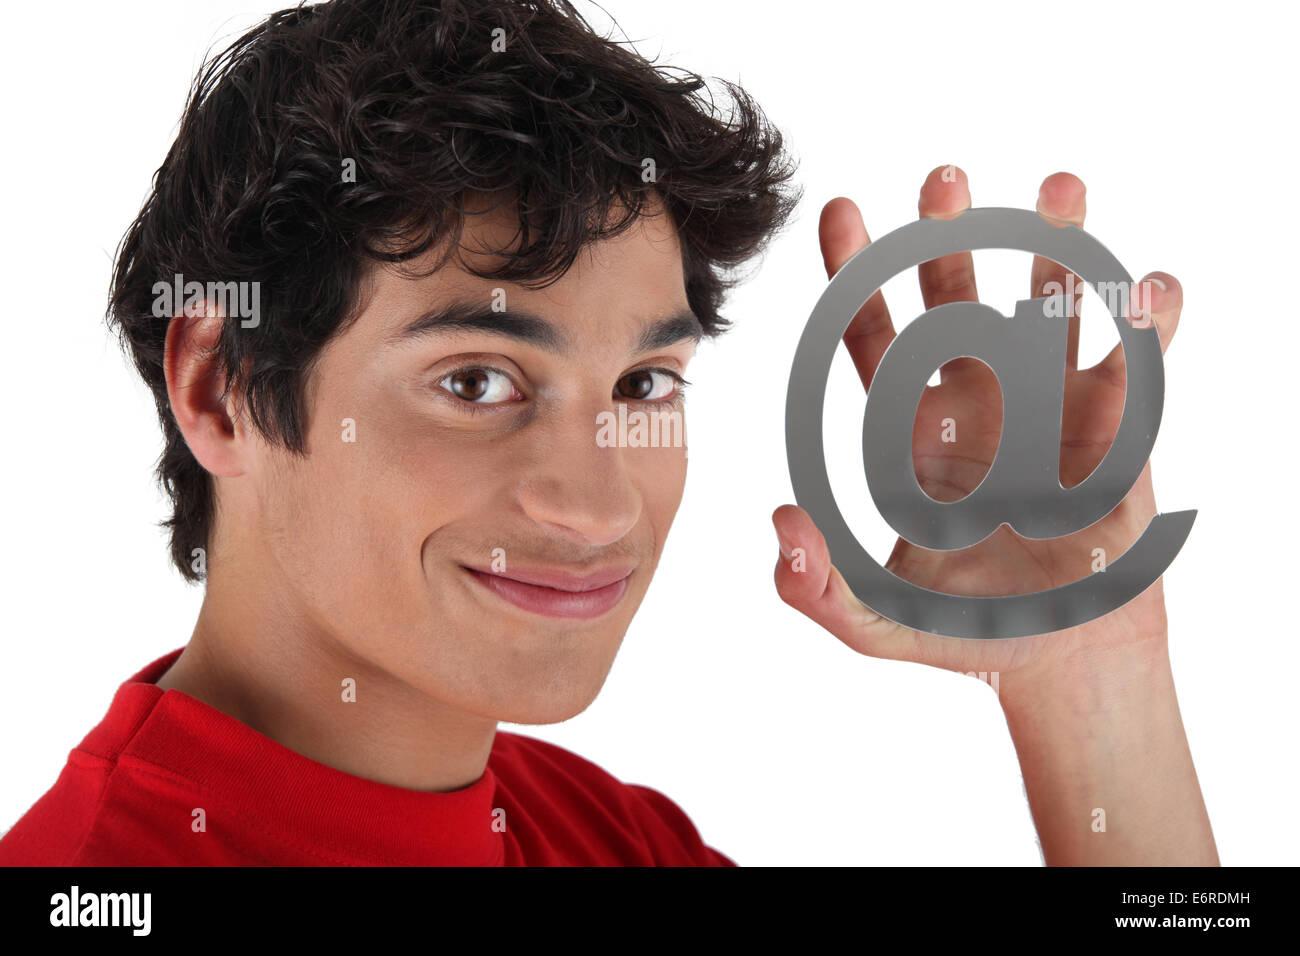 Man holding at symbol - Stock Image